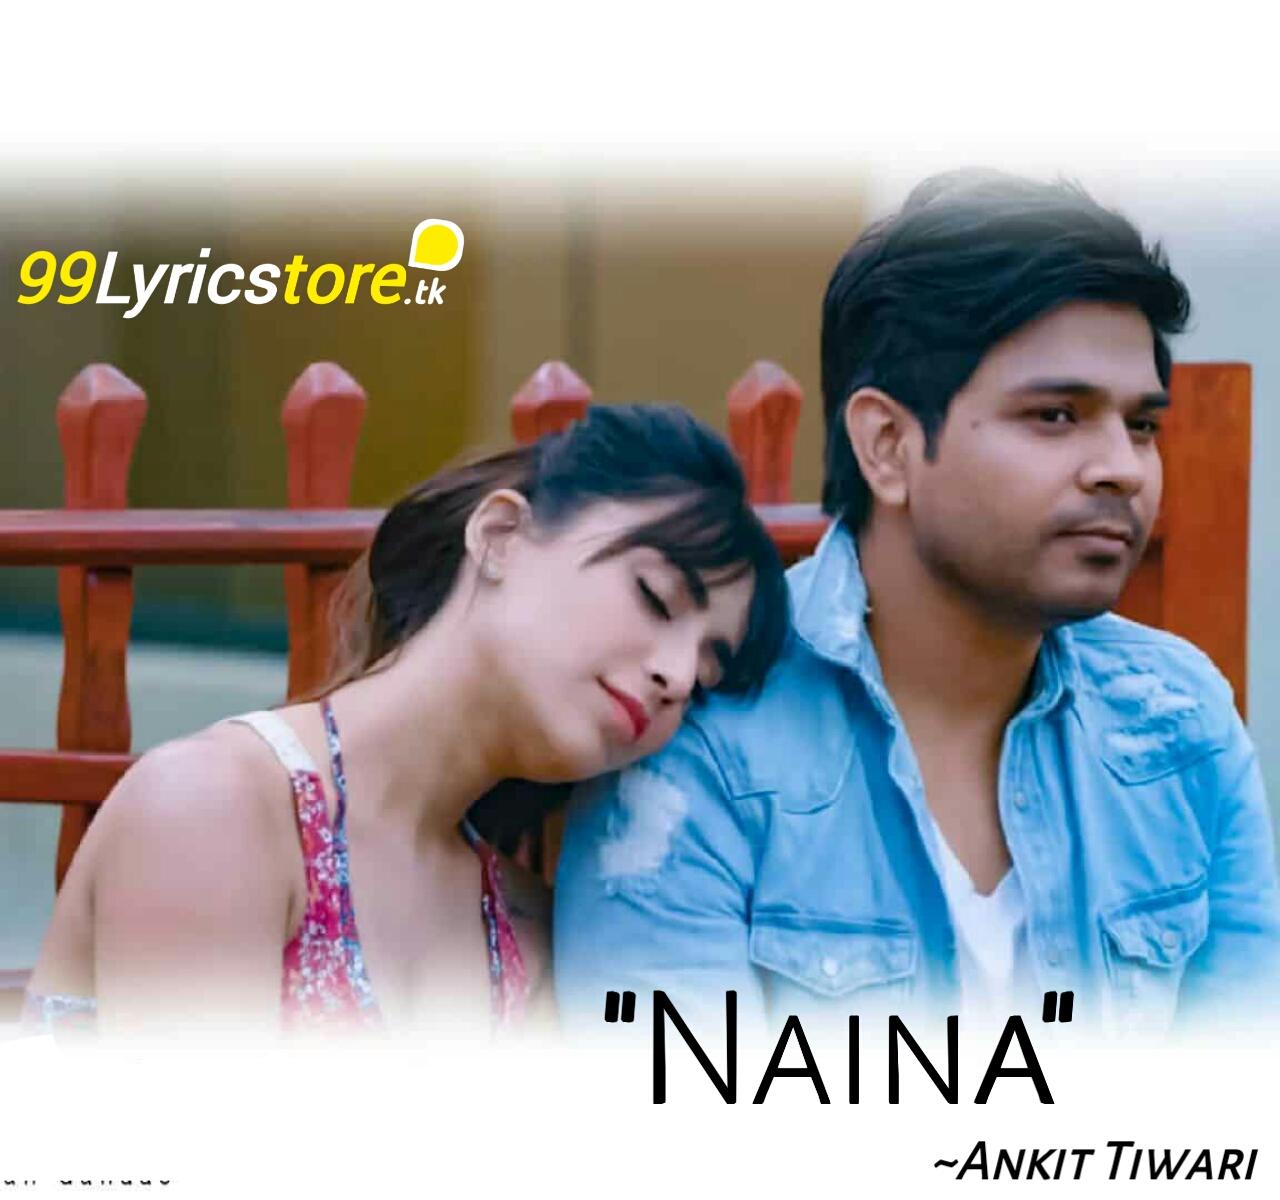 Ankit Tiwari Naina lyrics, Ankit Tiwari Album Song Lyrics, Latest Song Lyrics 2018, Hindi Sing Lyrics, Hindi Bollywood Album Song Lyrics